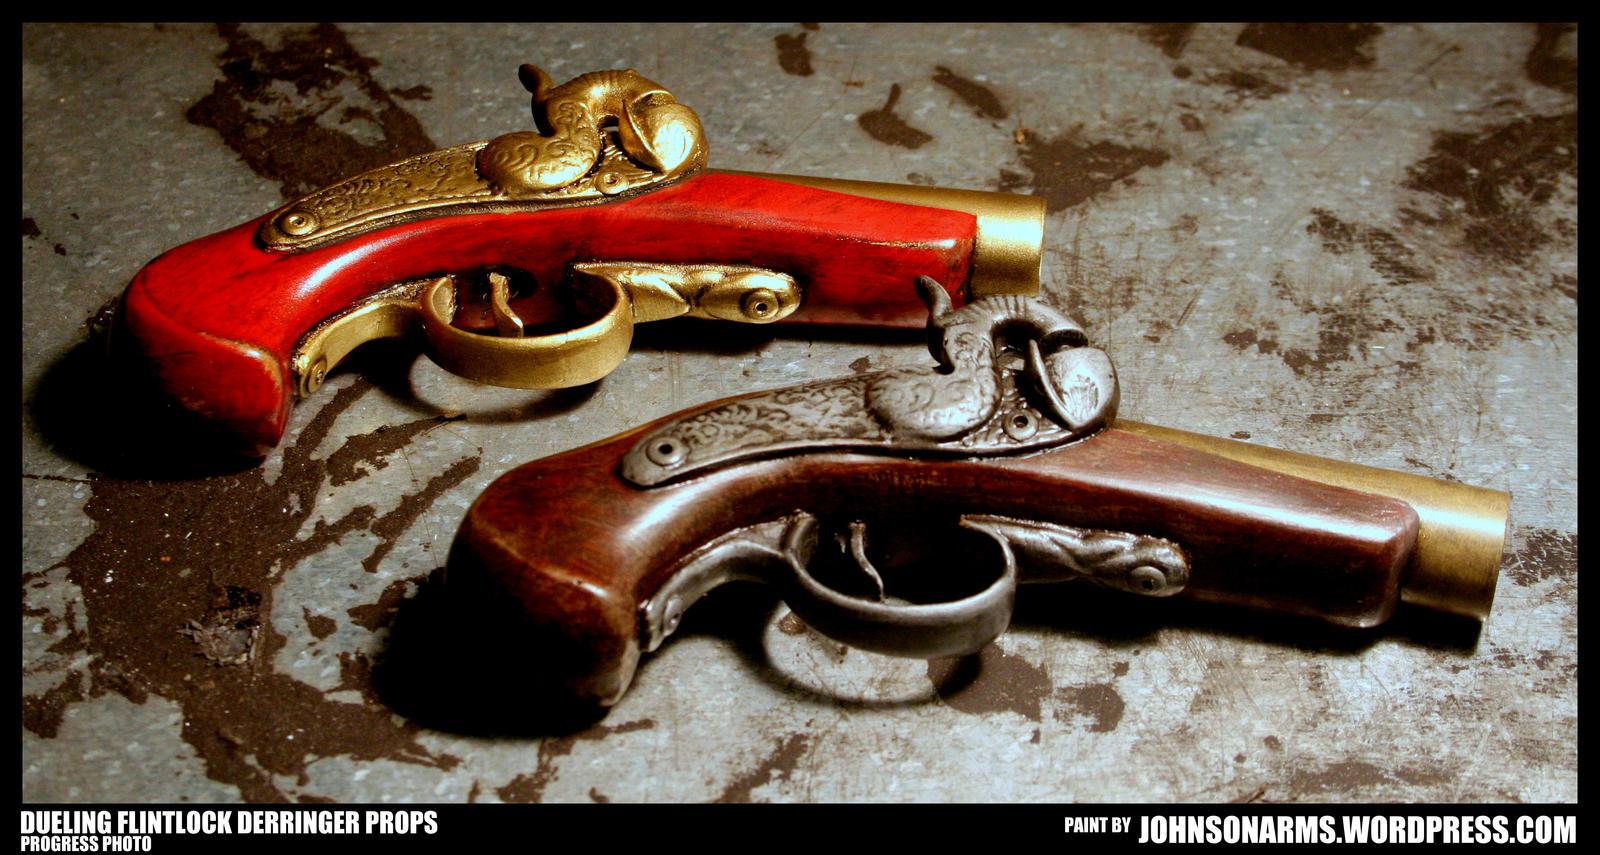 Dueling Flintlock Derringer Props by JohnsonArms